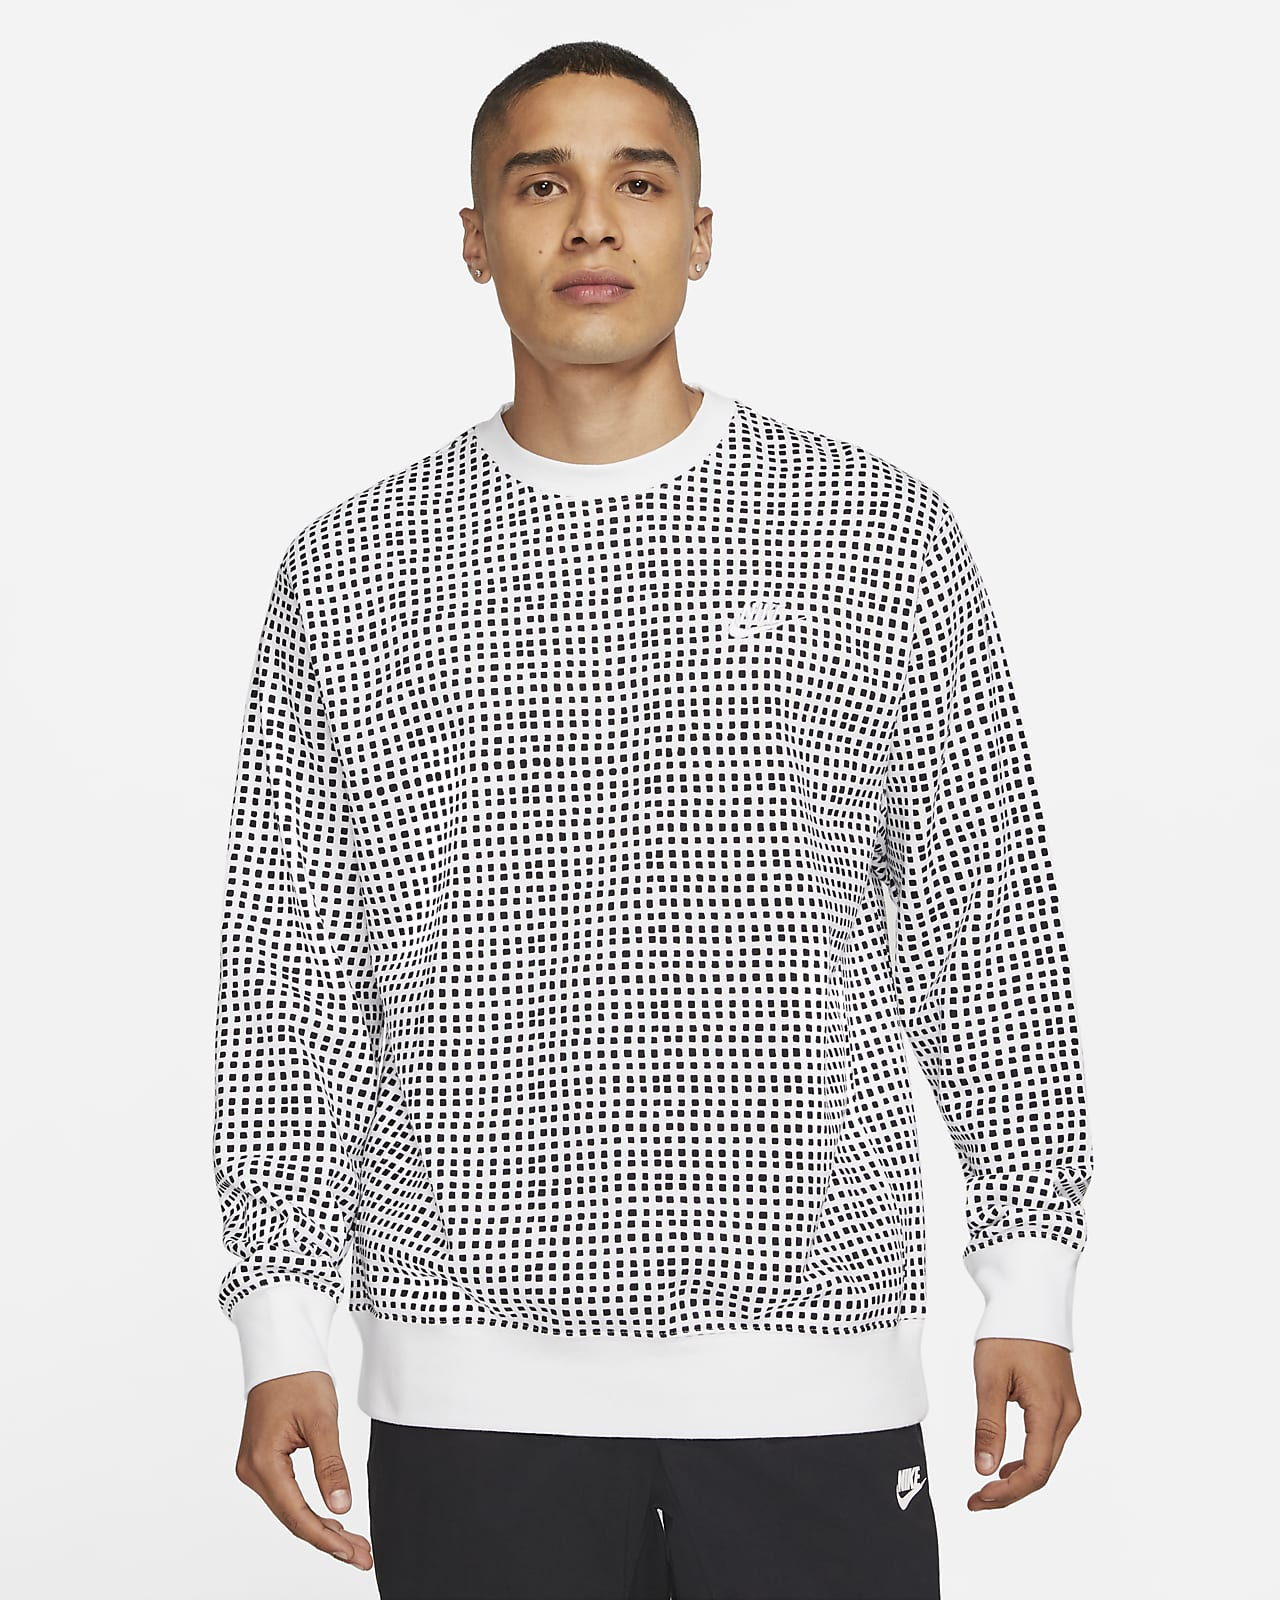 Nike Sportswear Club Men's Sweatshirt French Terry Crew